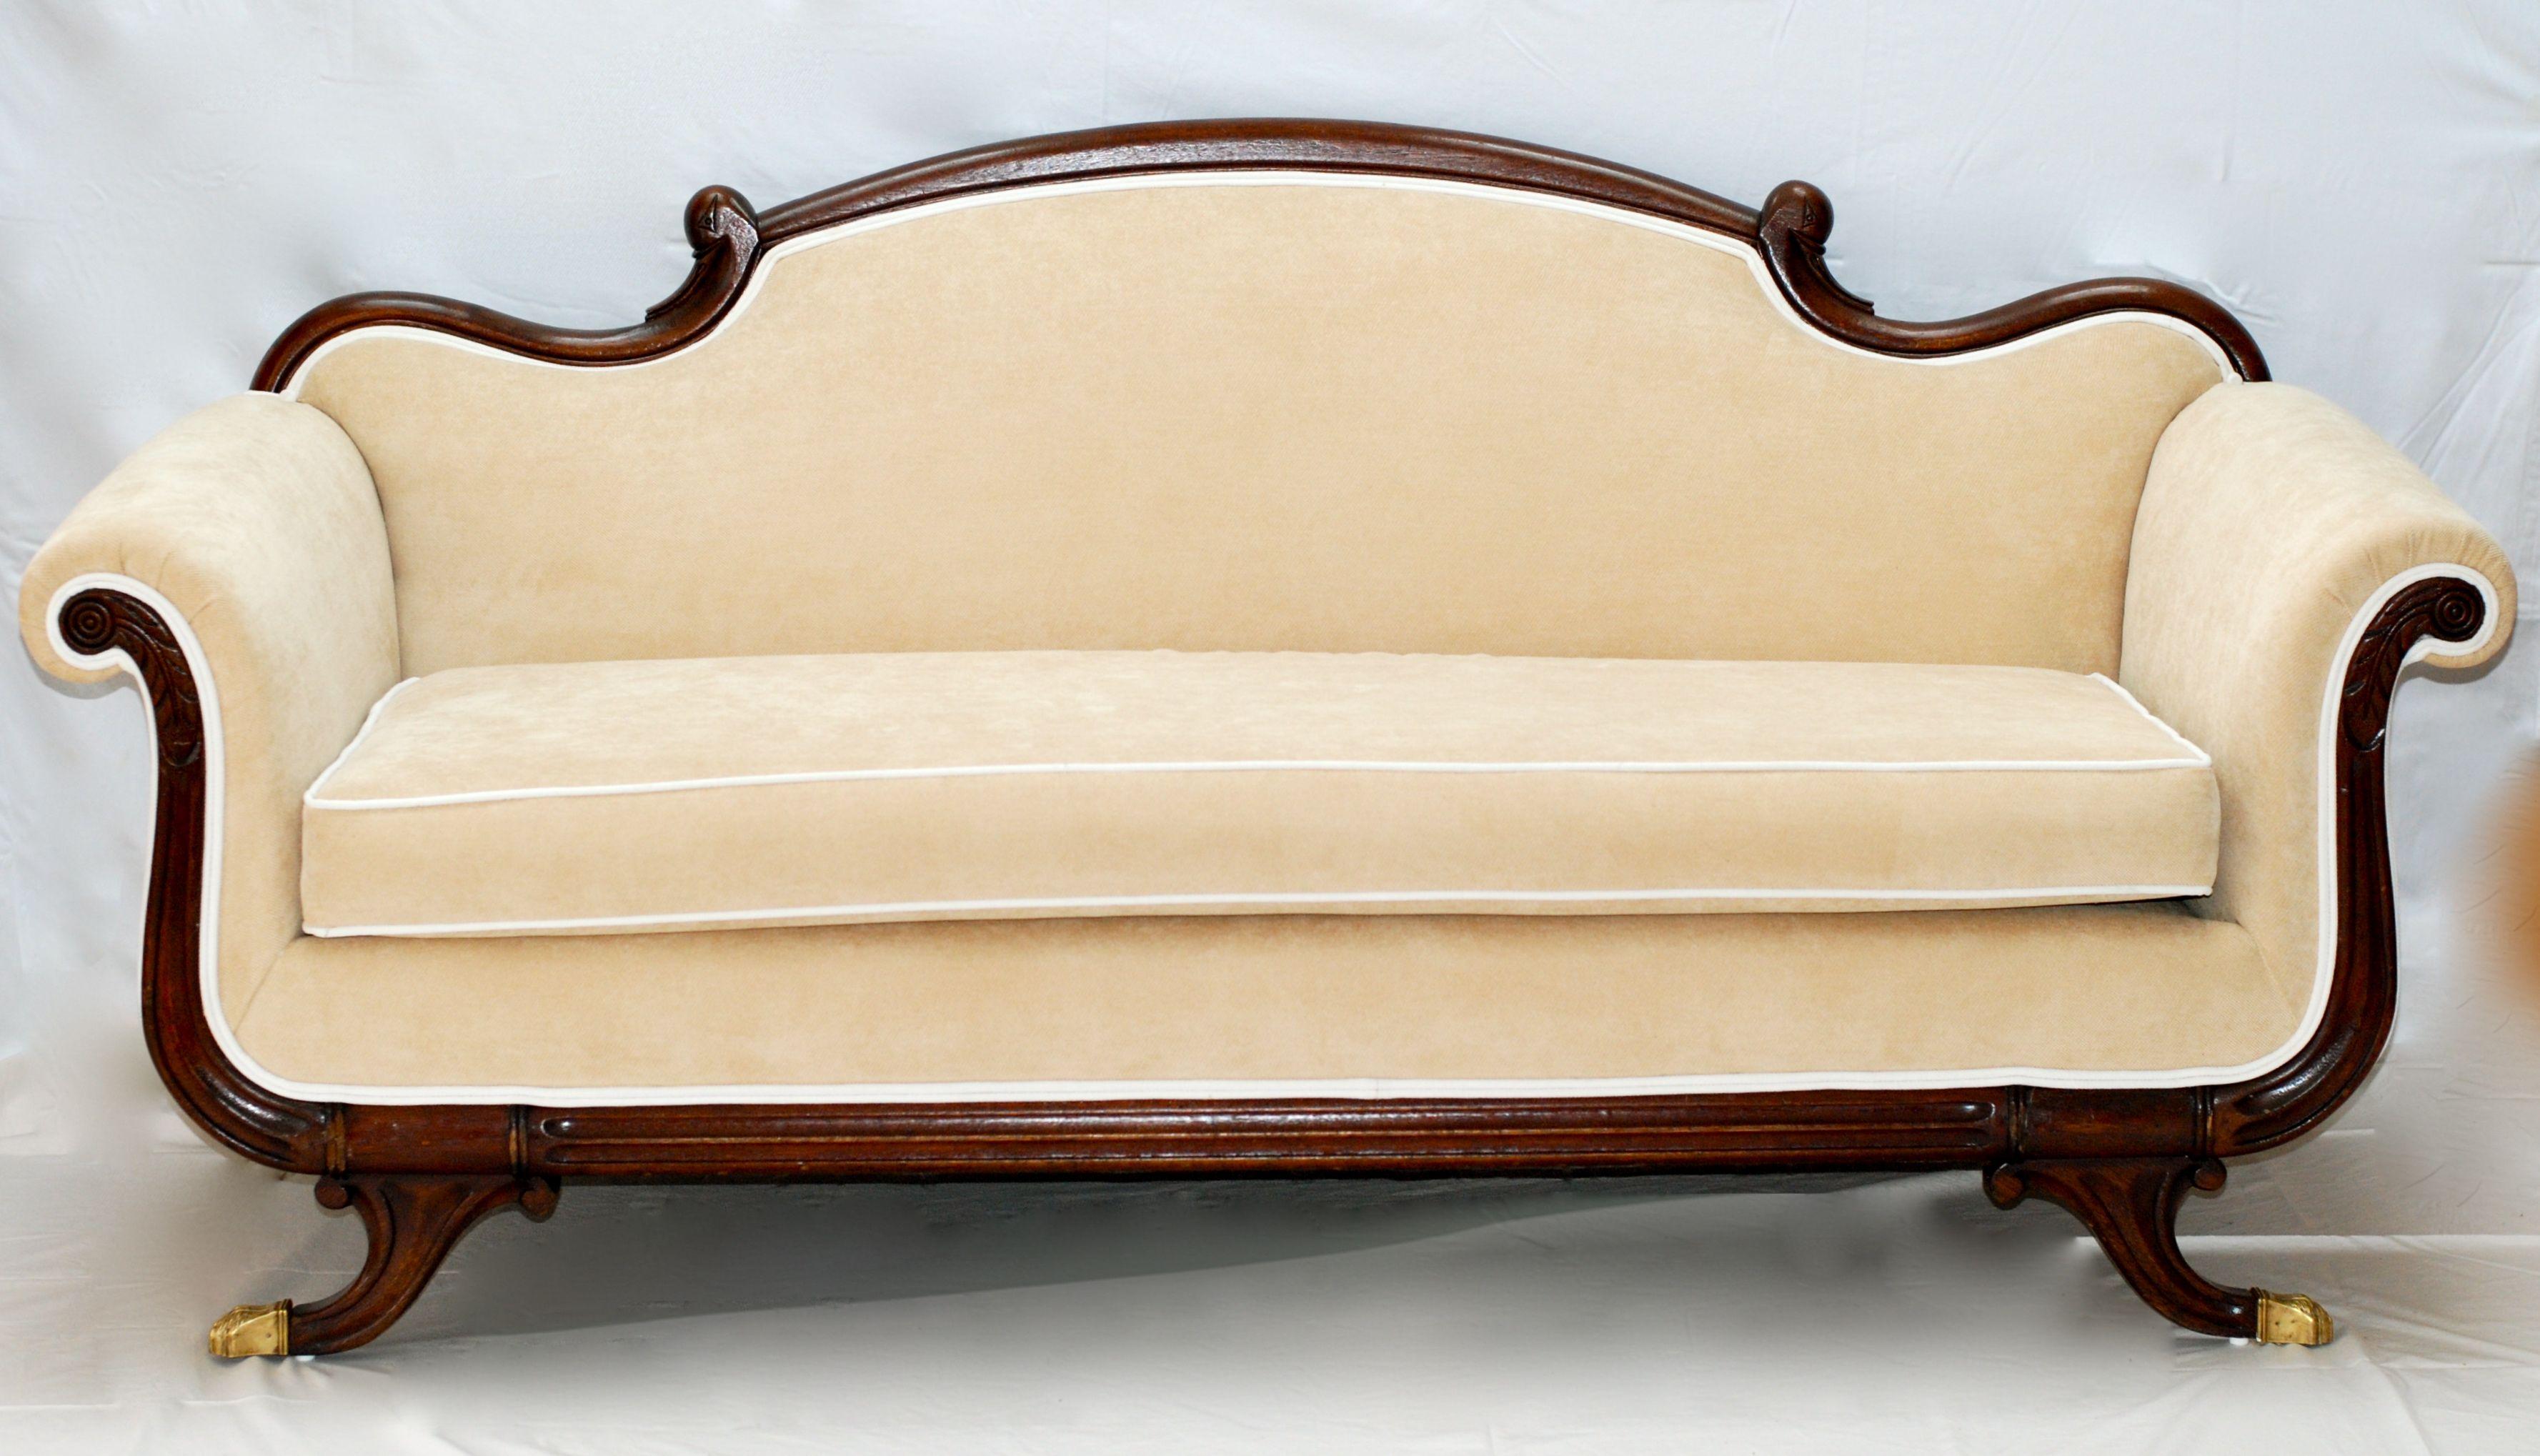 Reupholstered duncan phyfe sofa duncan phyfe pinterest duncan phyfe and upholstery Reupholster loveseat